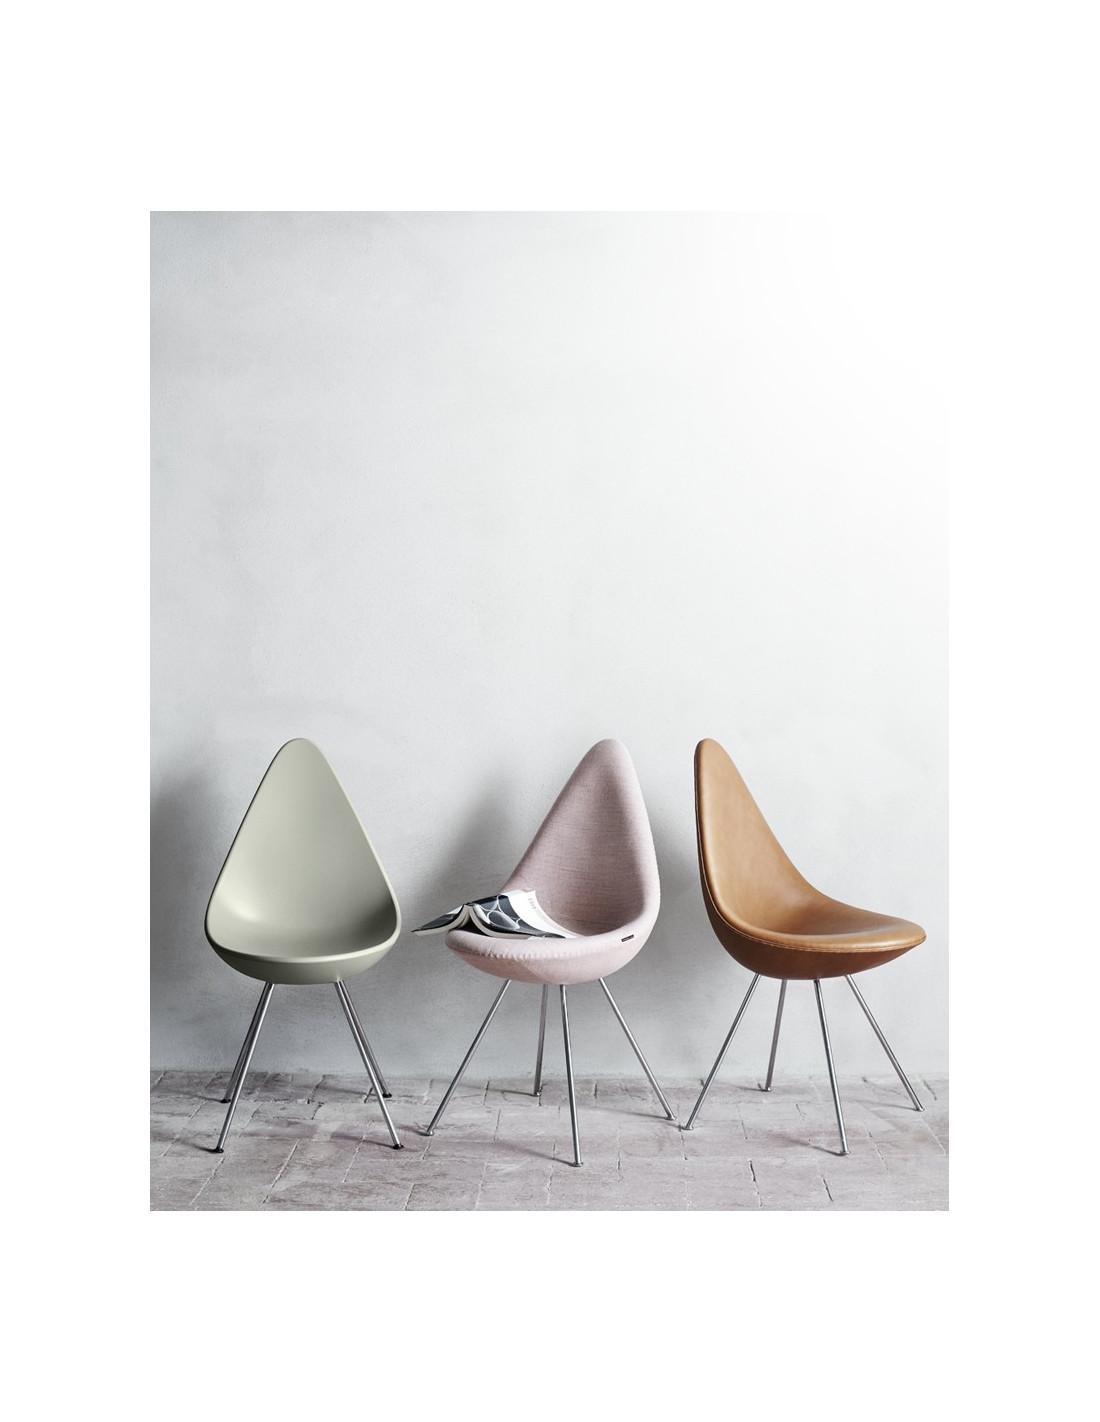 drop chair arne jacobsen fritz hansen. Black Bedroom Furniture Sets. Home Design Ideas